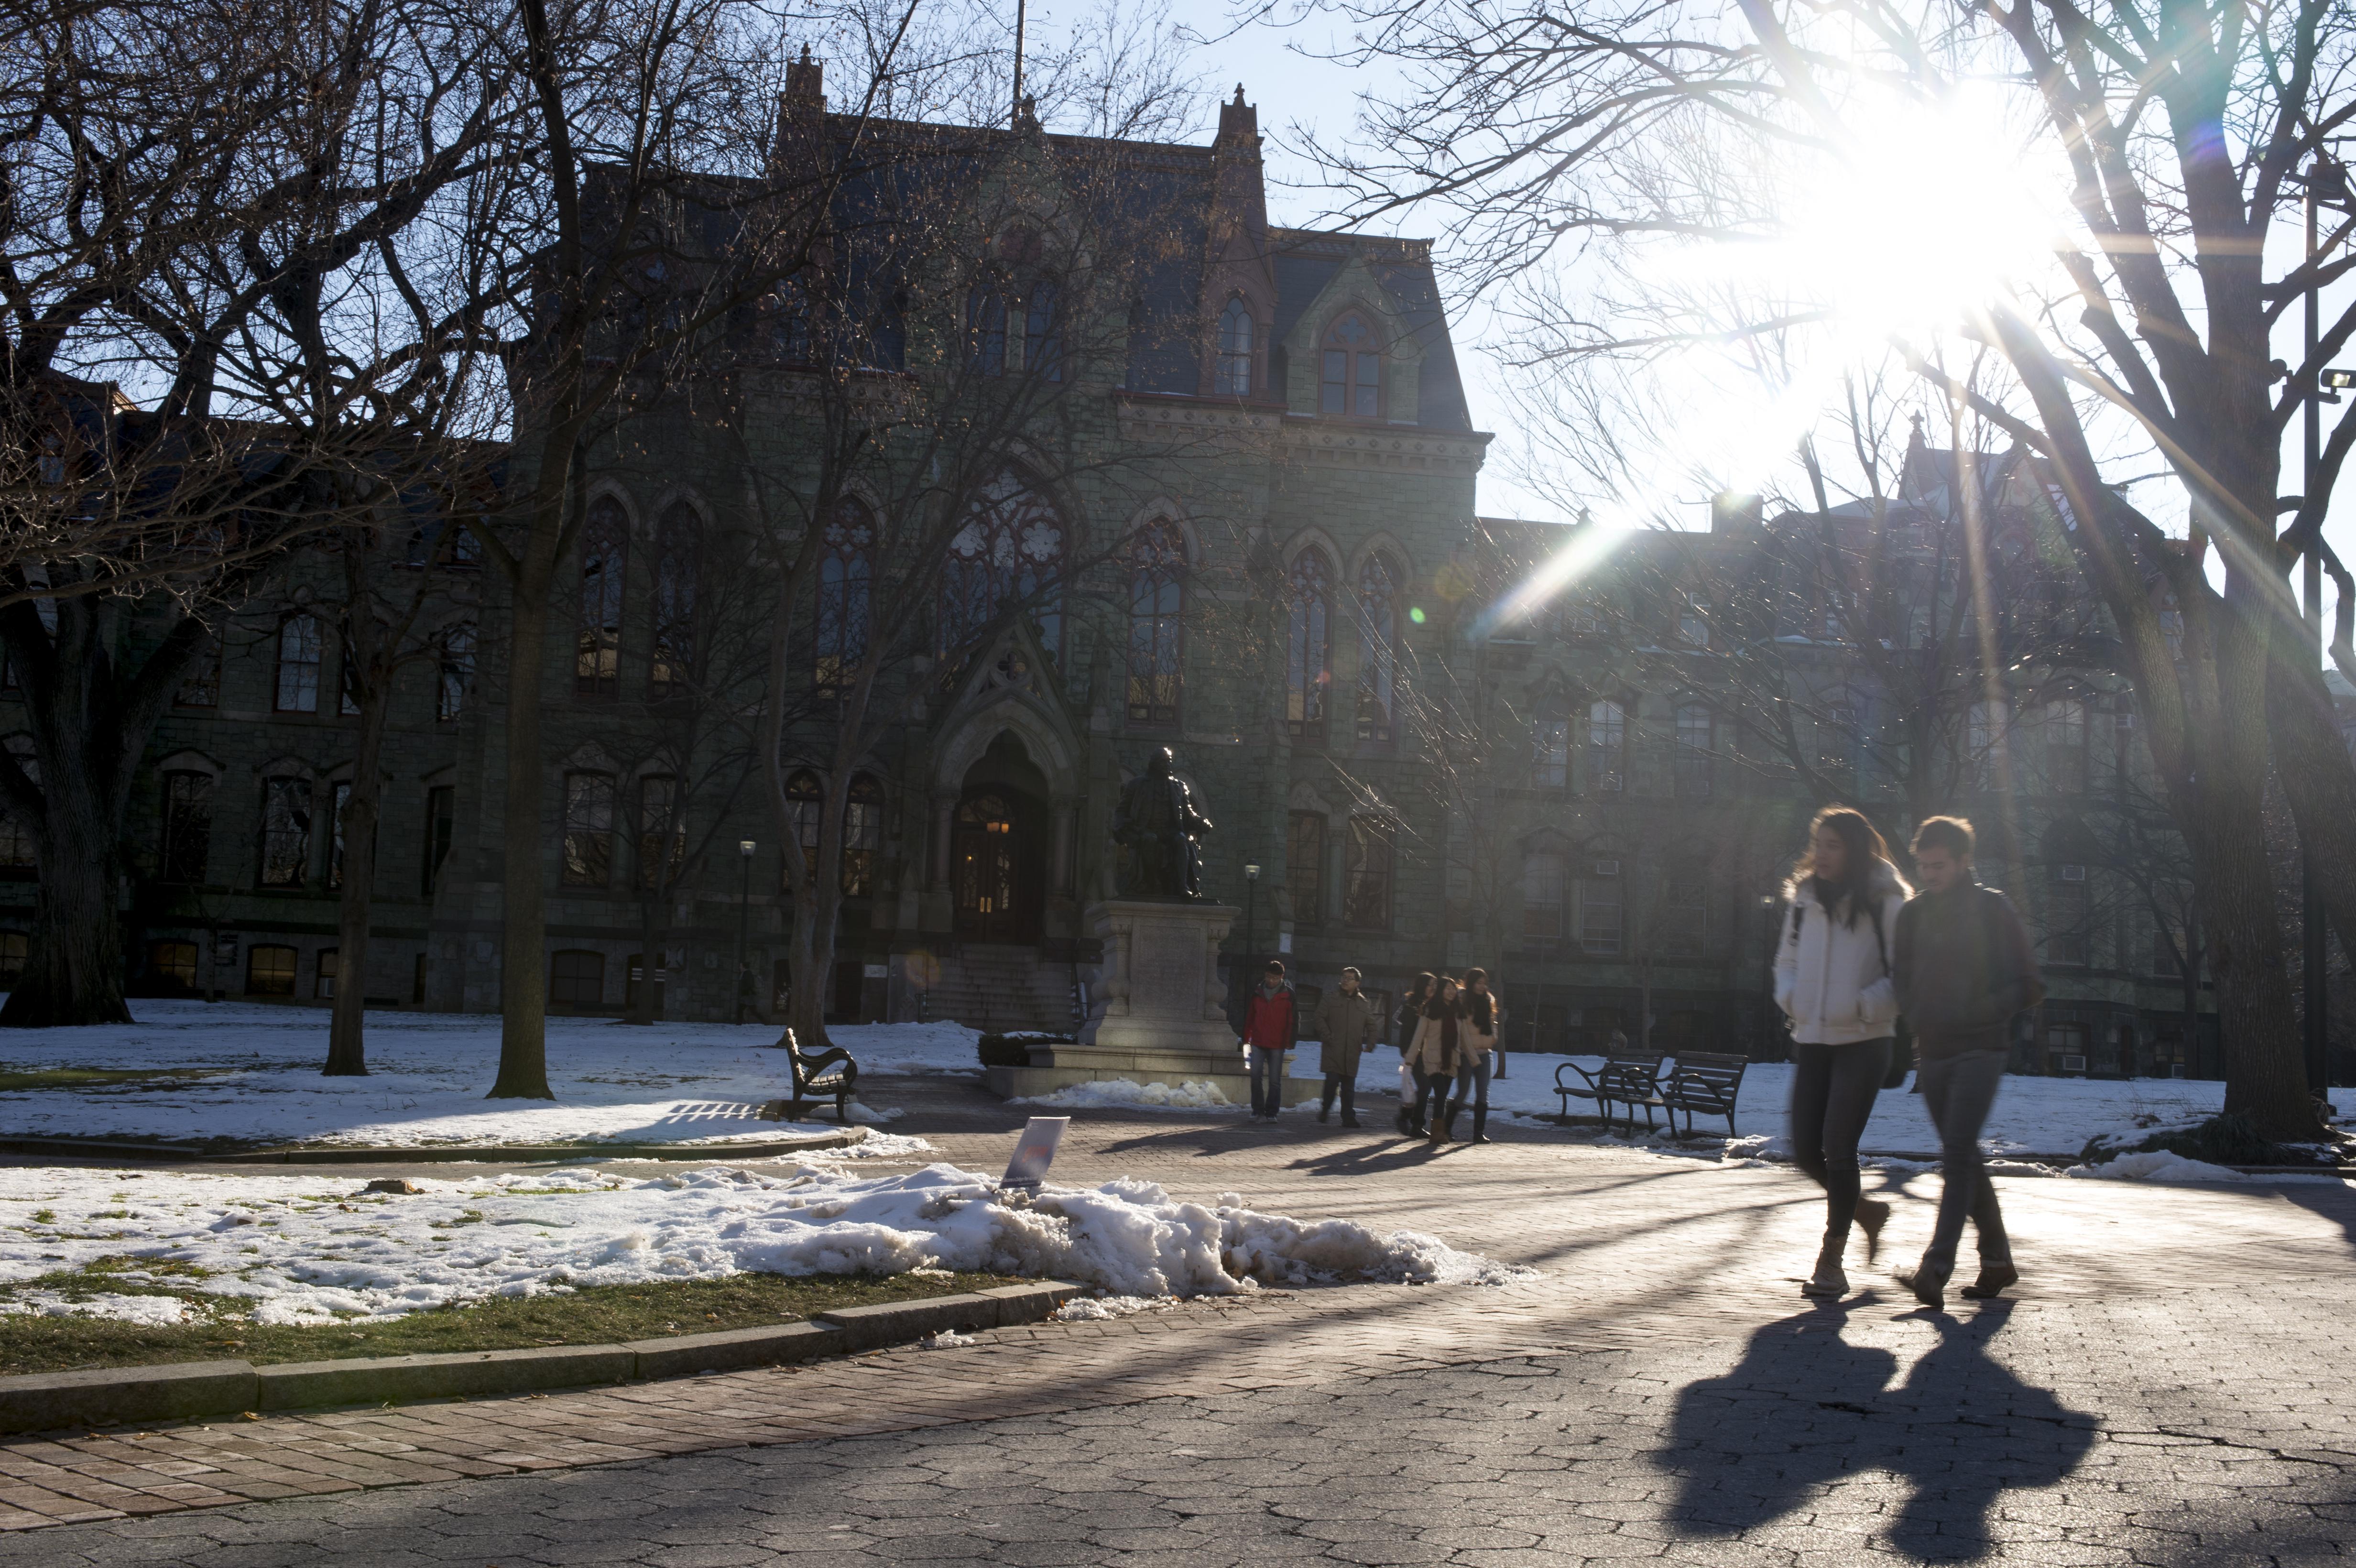 Students walk through the University of Pennsylvania campus on December 16, 2013 in Philadelphia, Pennsylvania.